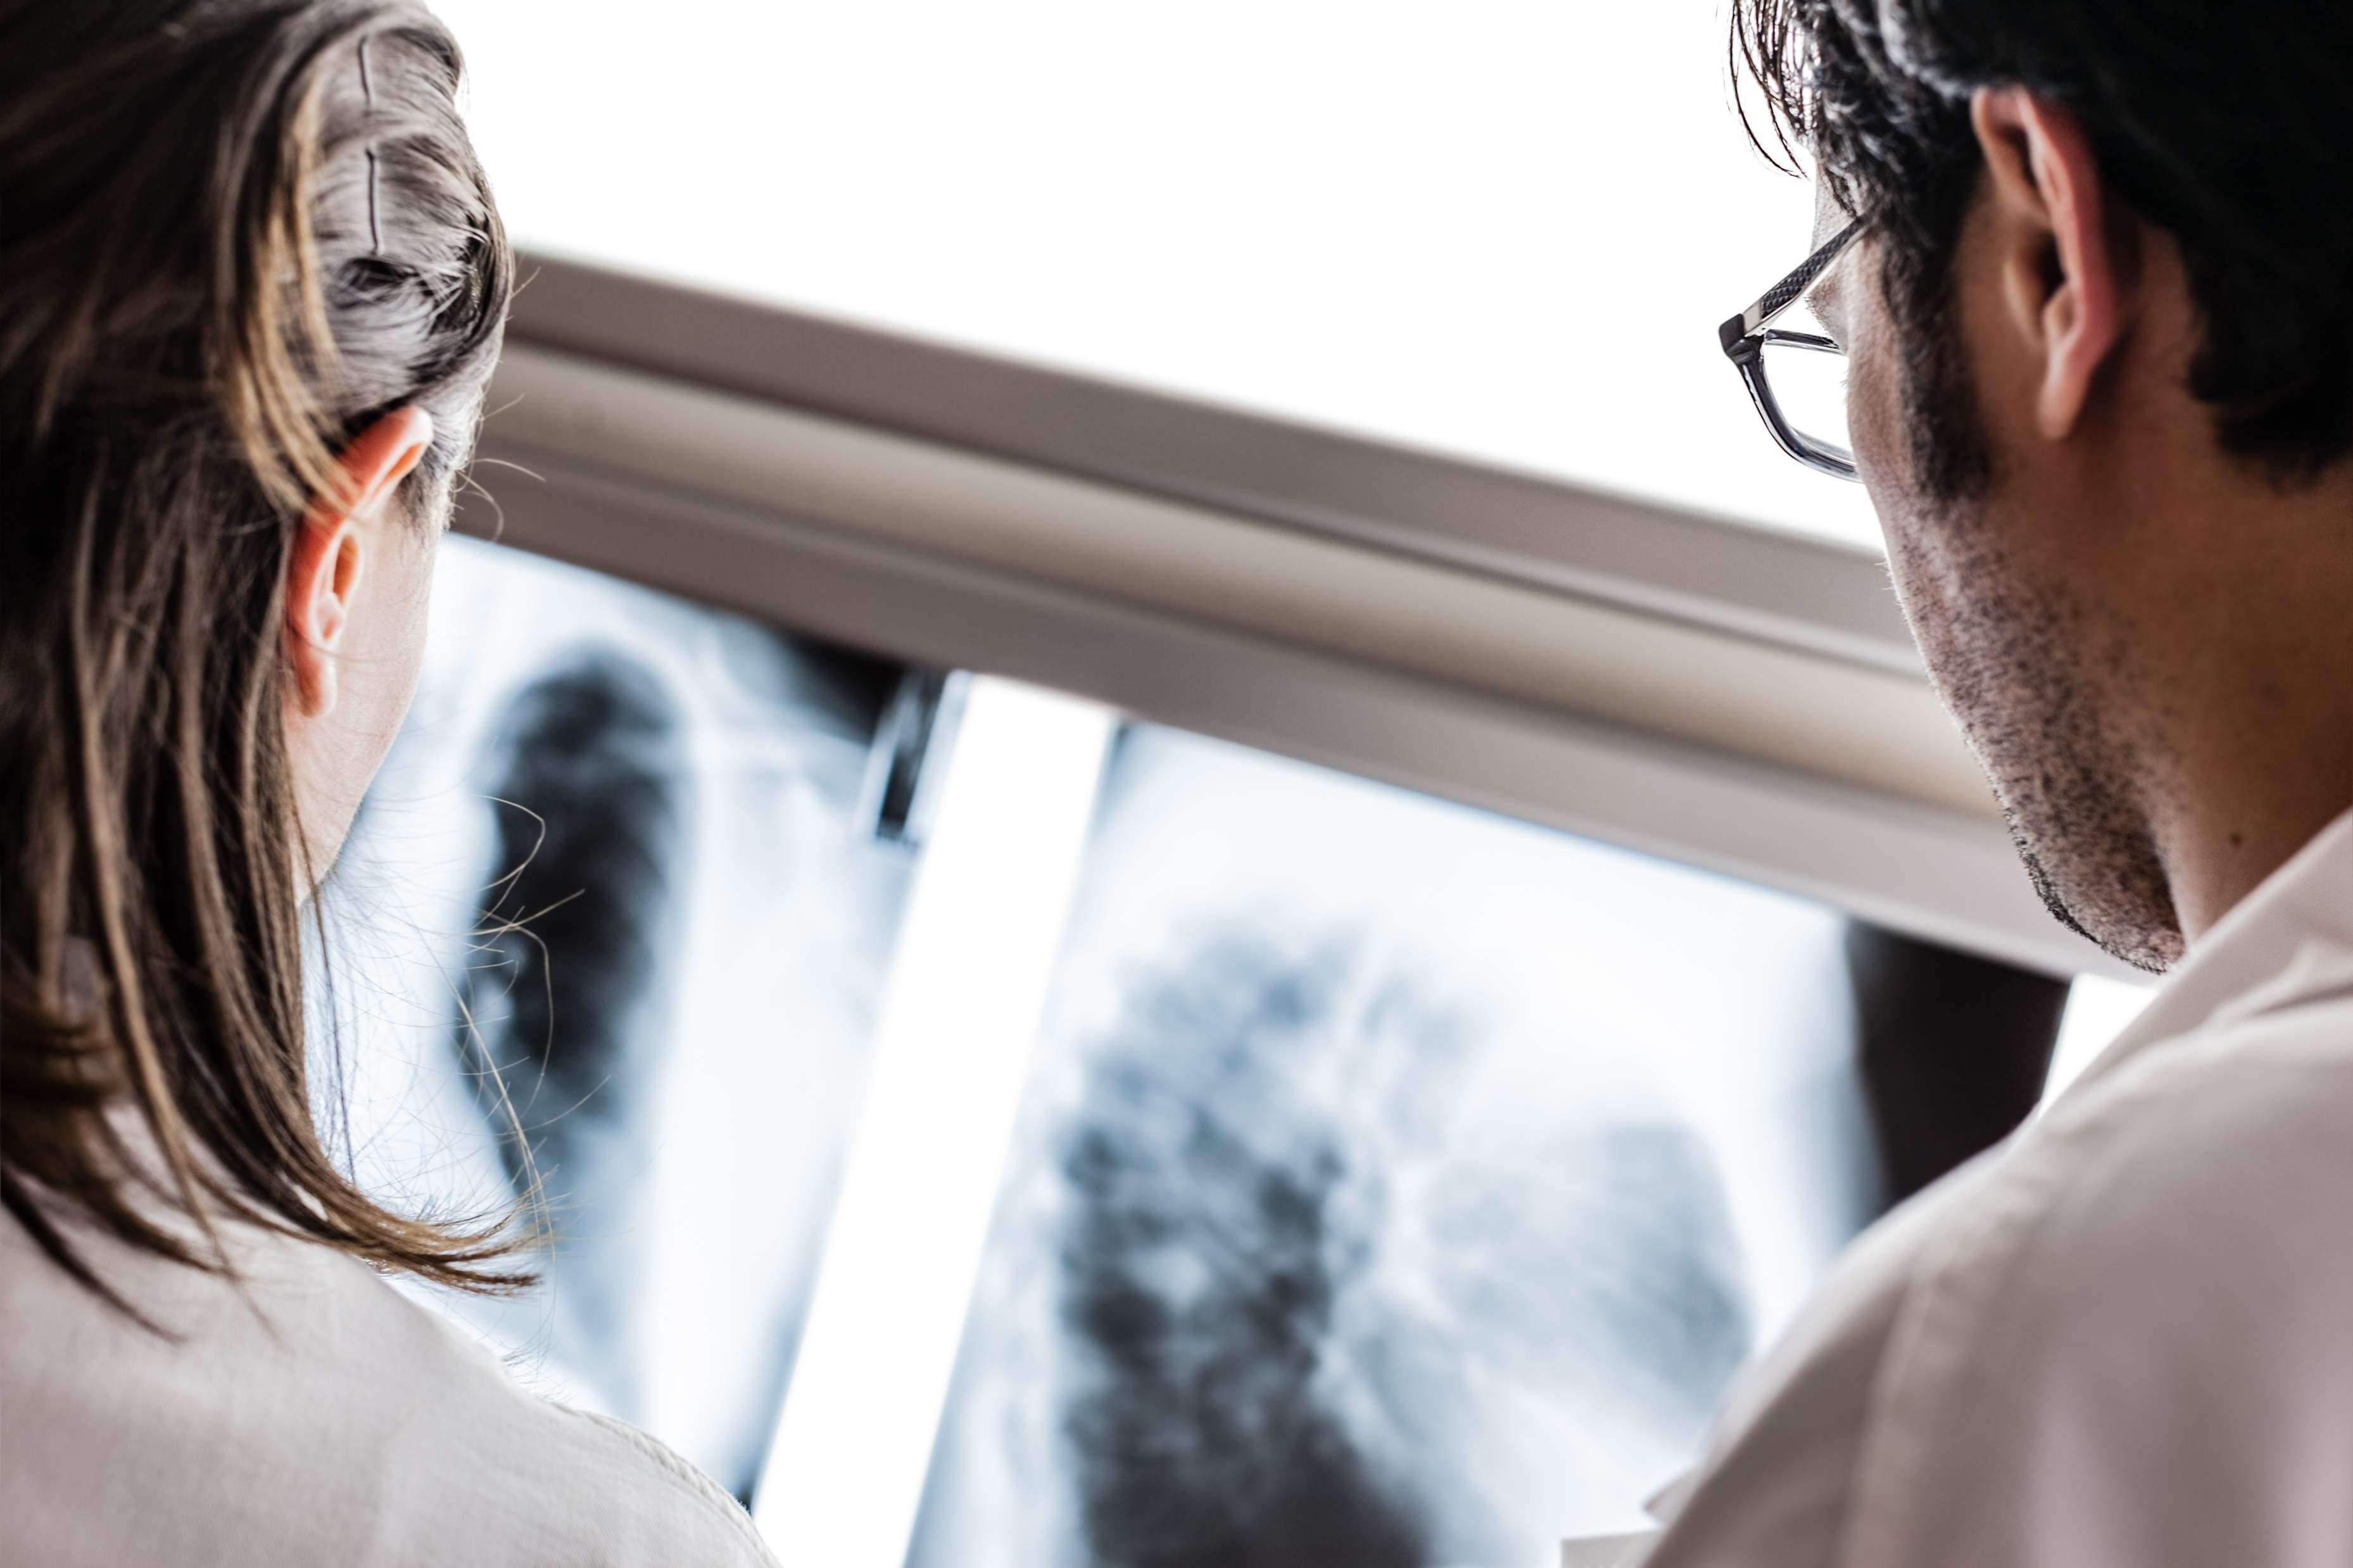 diagnostic-radiography-E9QA5MC